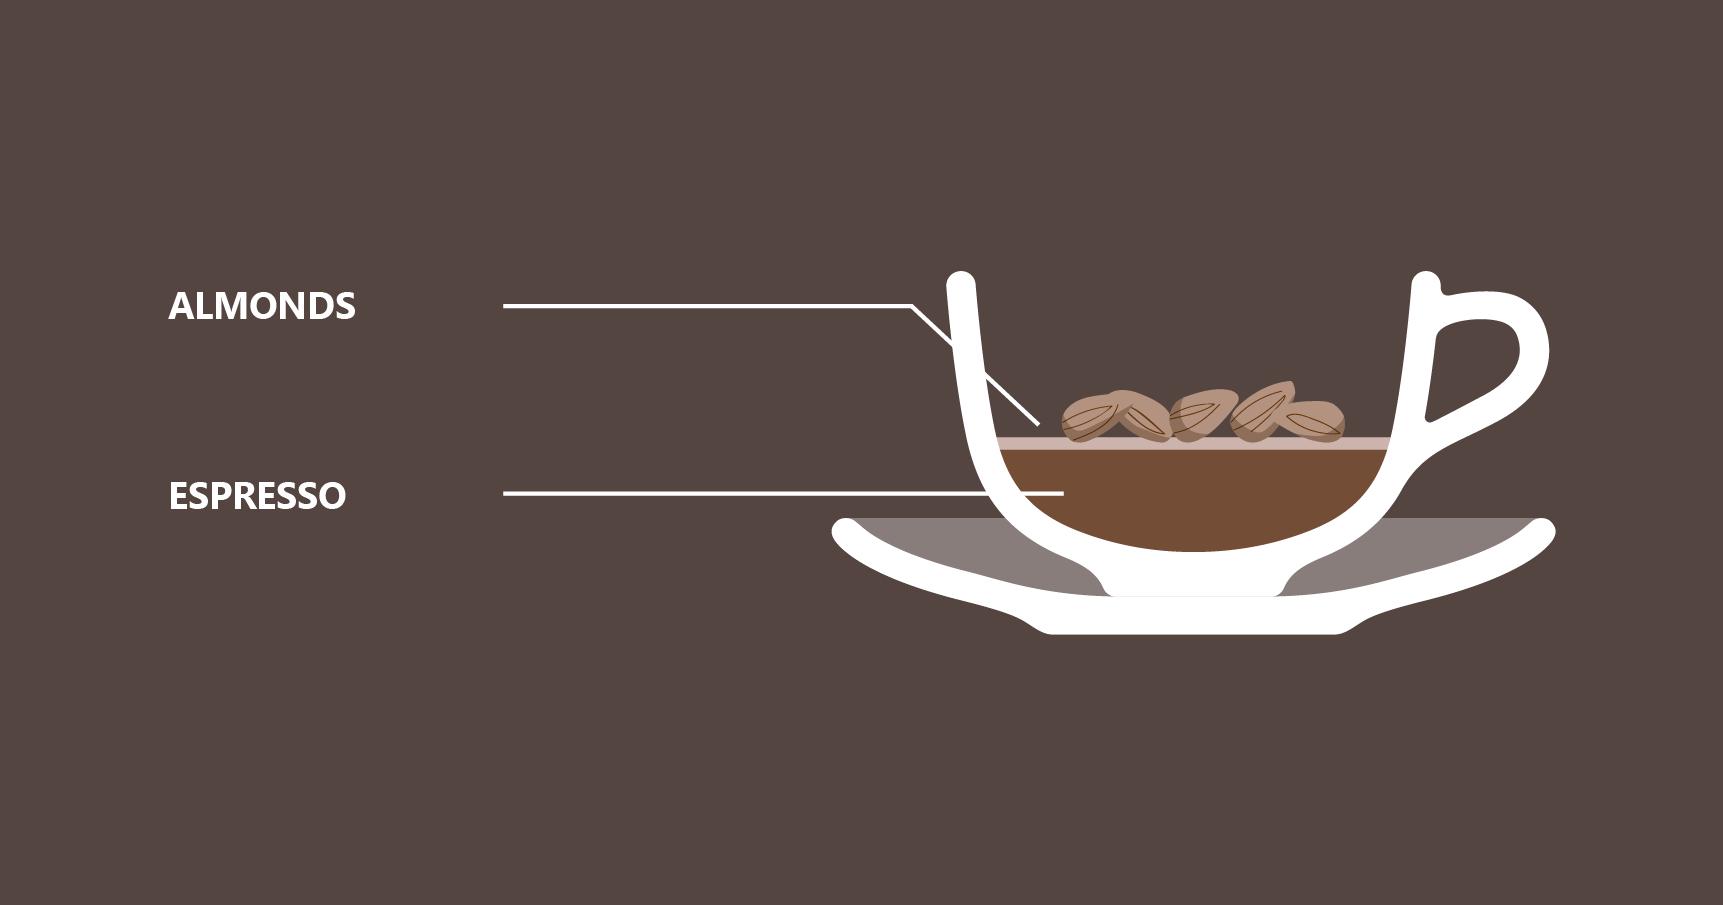 Vegan-Friendly Caffe Breve recipe illustration